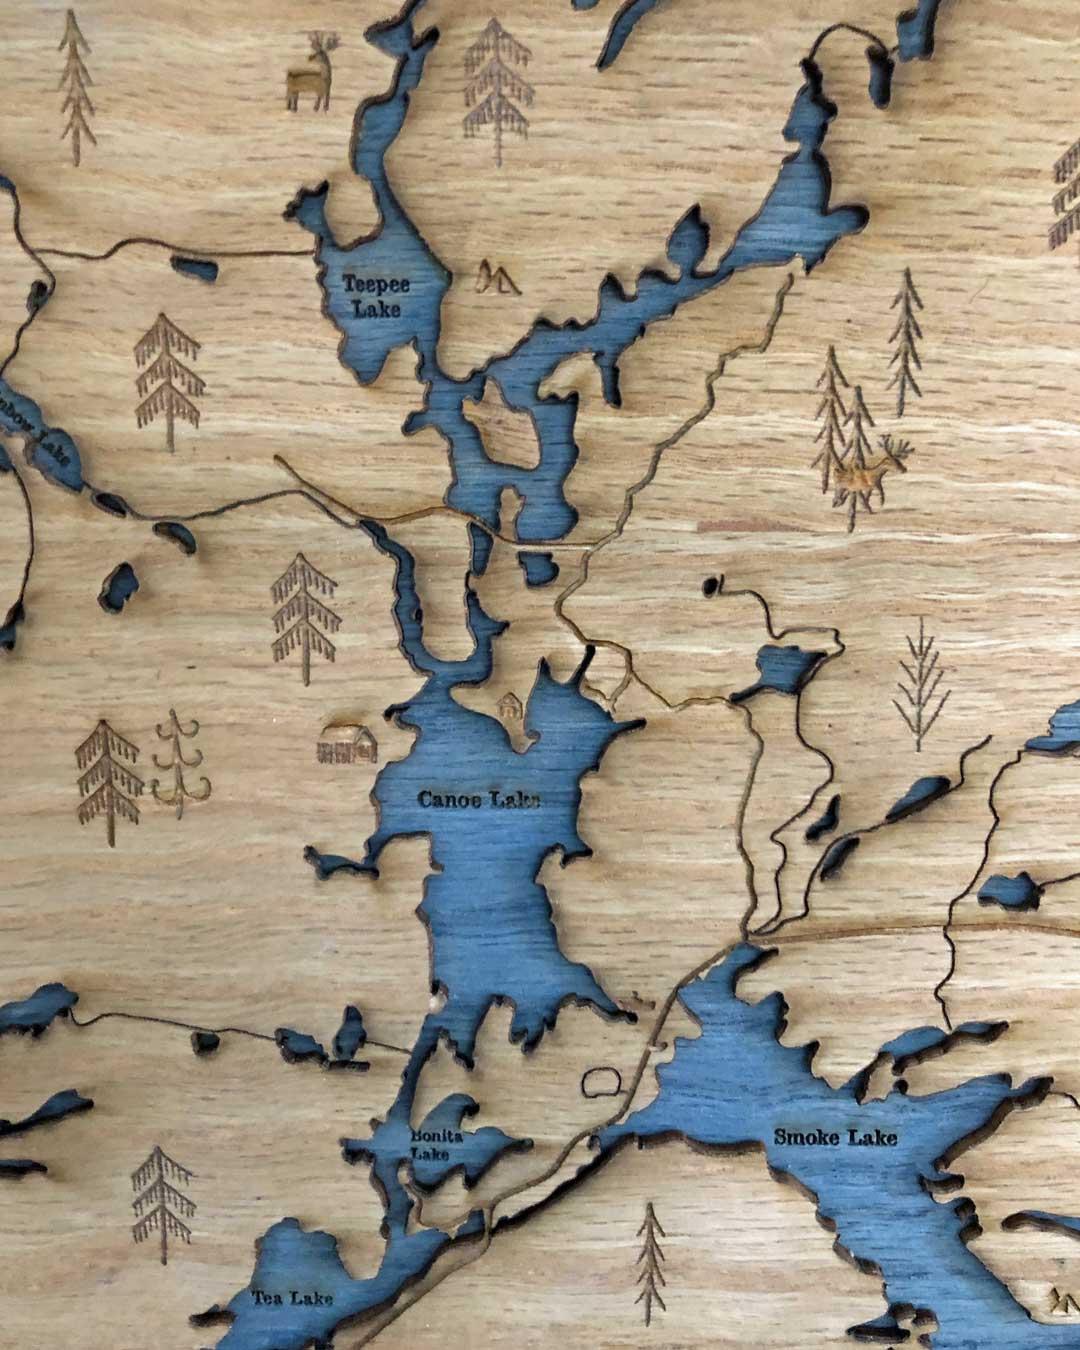 Algonquin Park Trout Lake To Canoe Lake Laser Cut Map